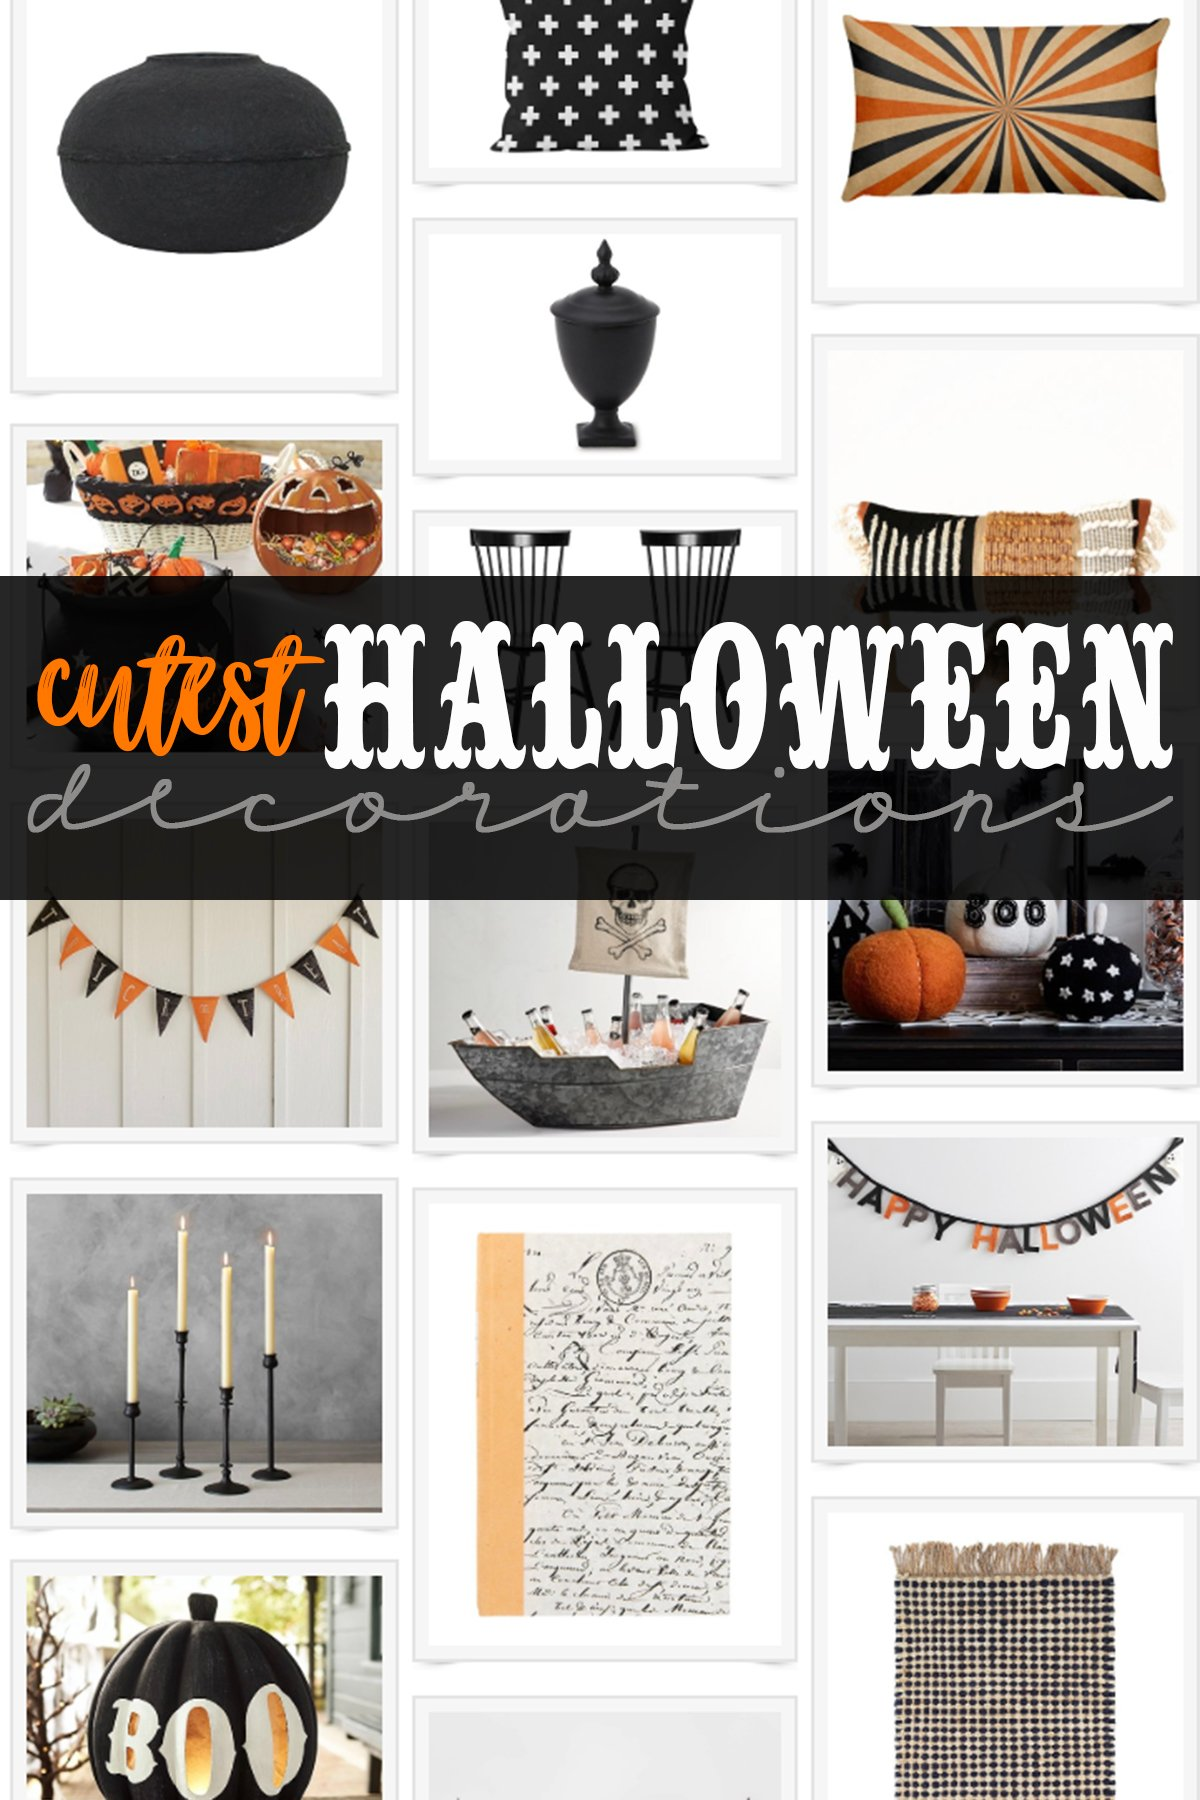 Cute indoor halloween decorating ideas